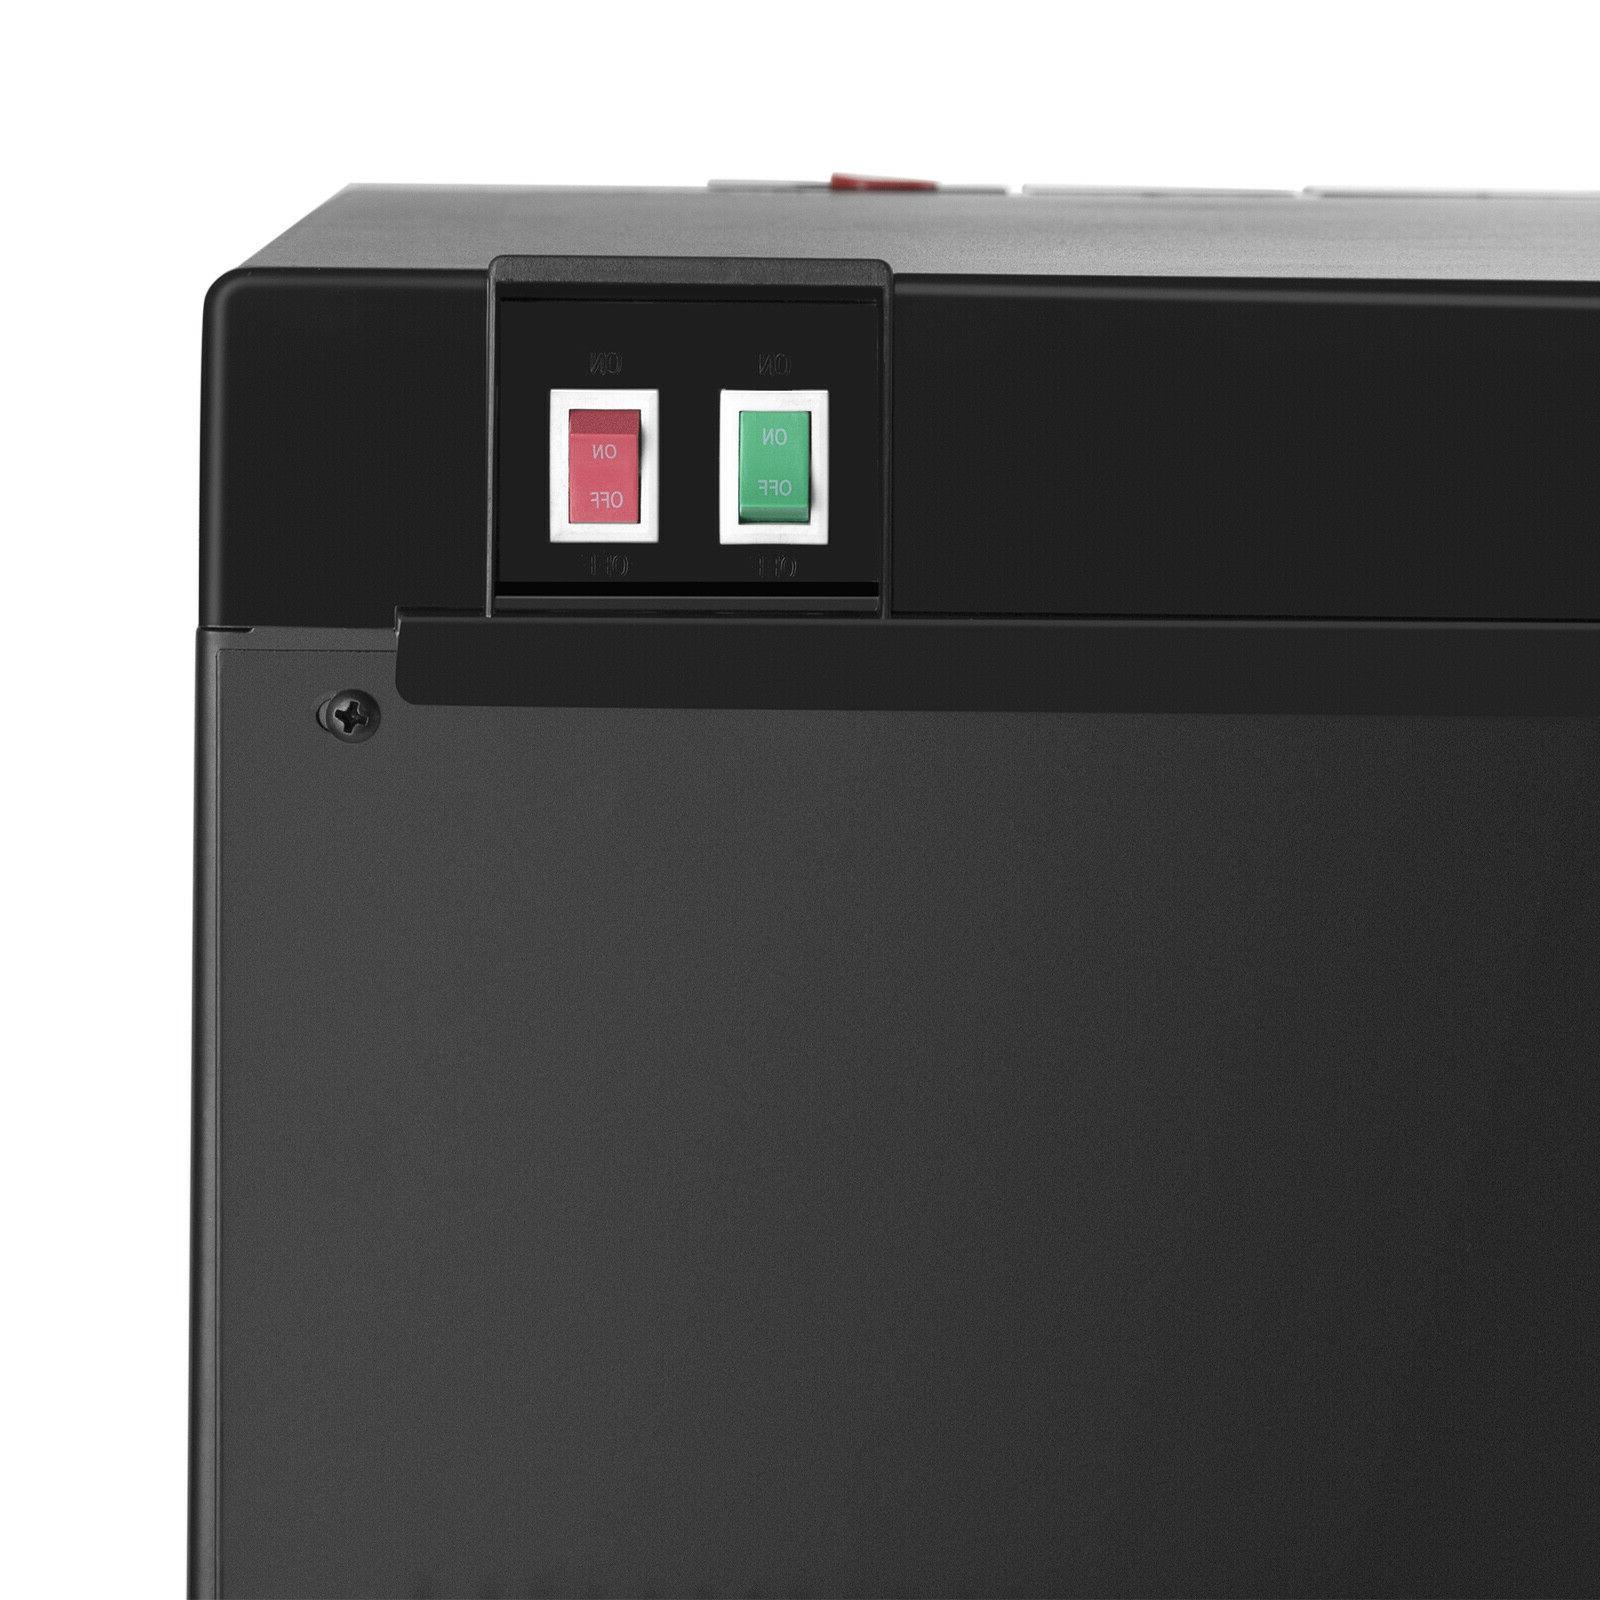 Bottom Loading Dispenser Stainless Steel 3-Temperatures Safety